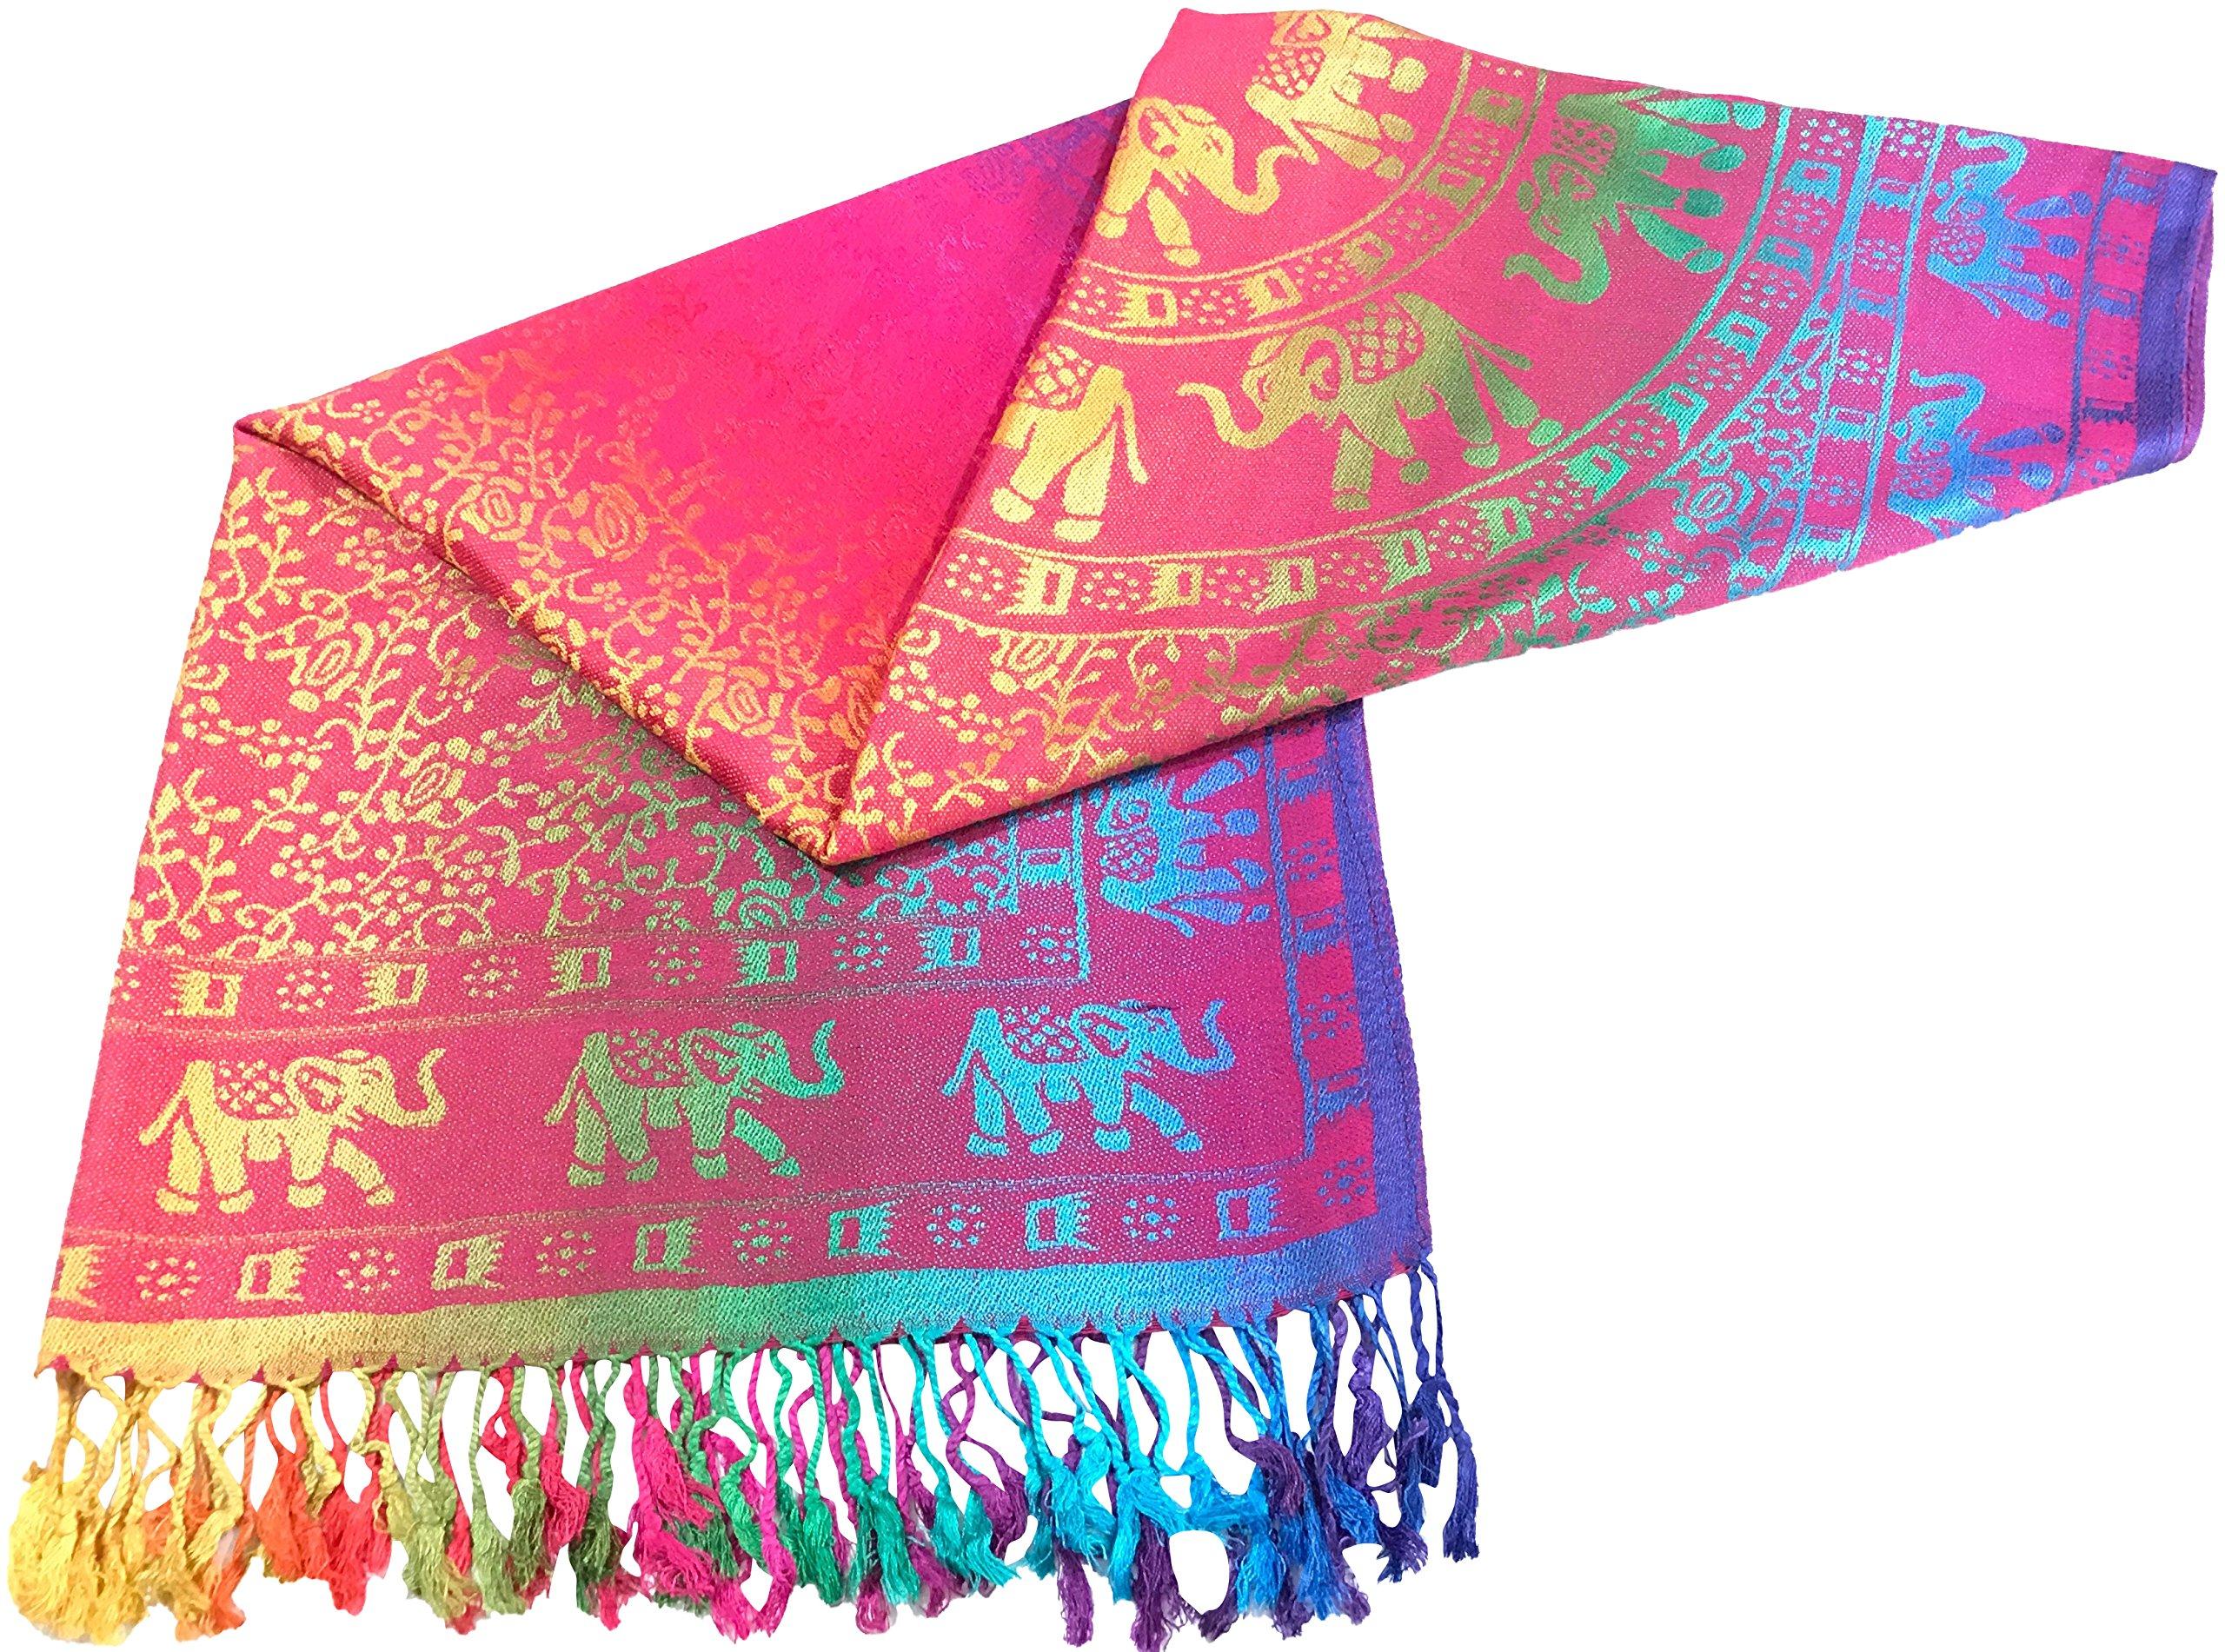 CJ Apparel Pink Elephant Design Shawl Scarf Wrap Stole Pashmina Seconds NEW